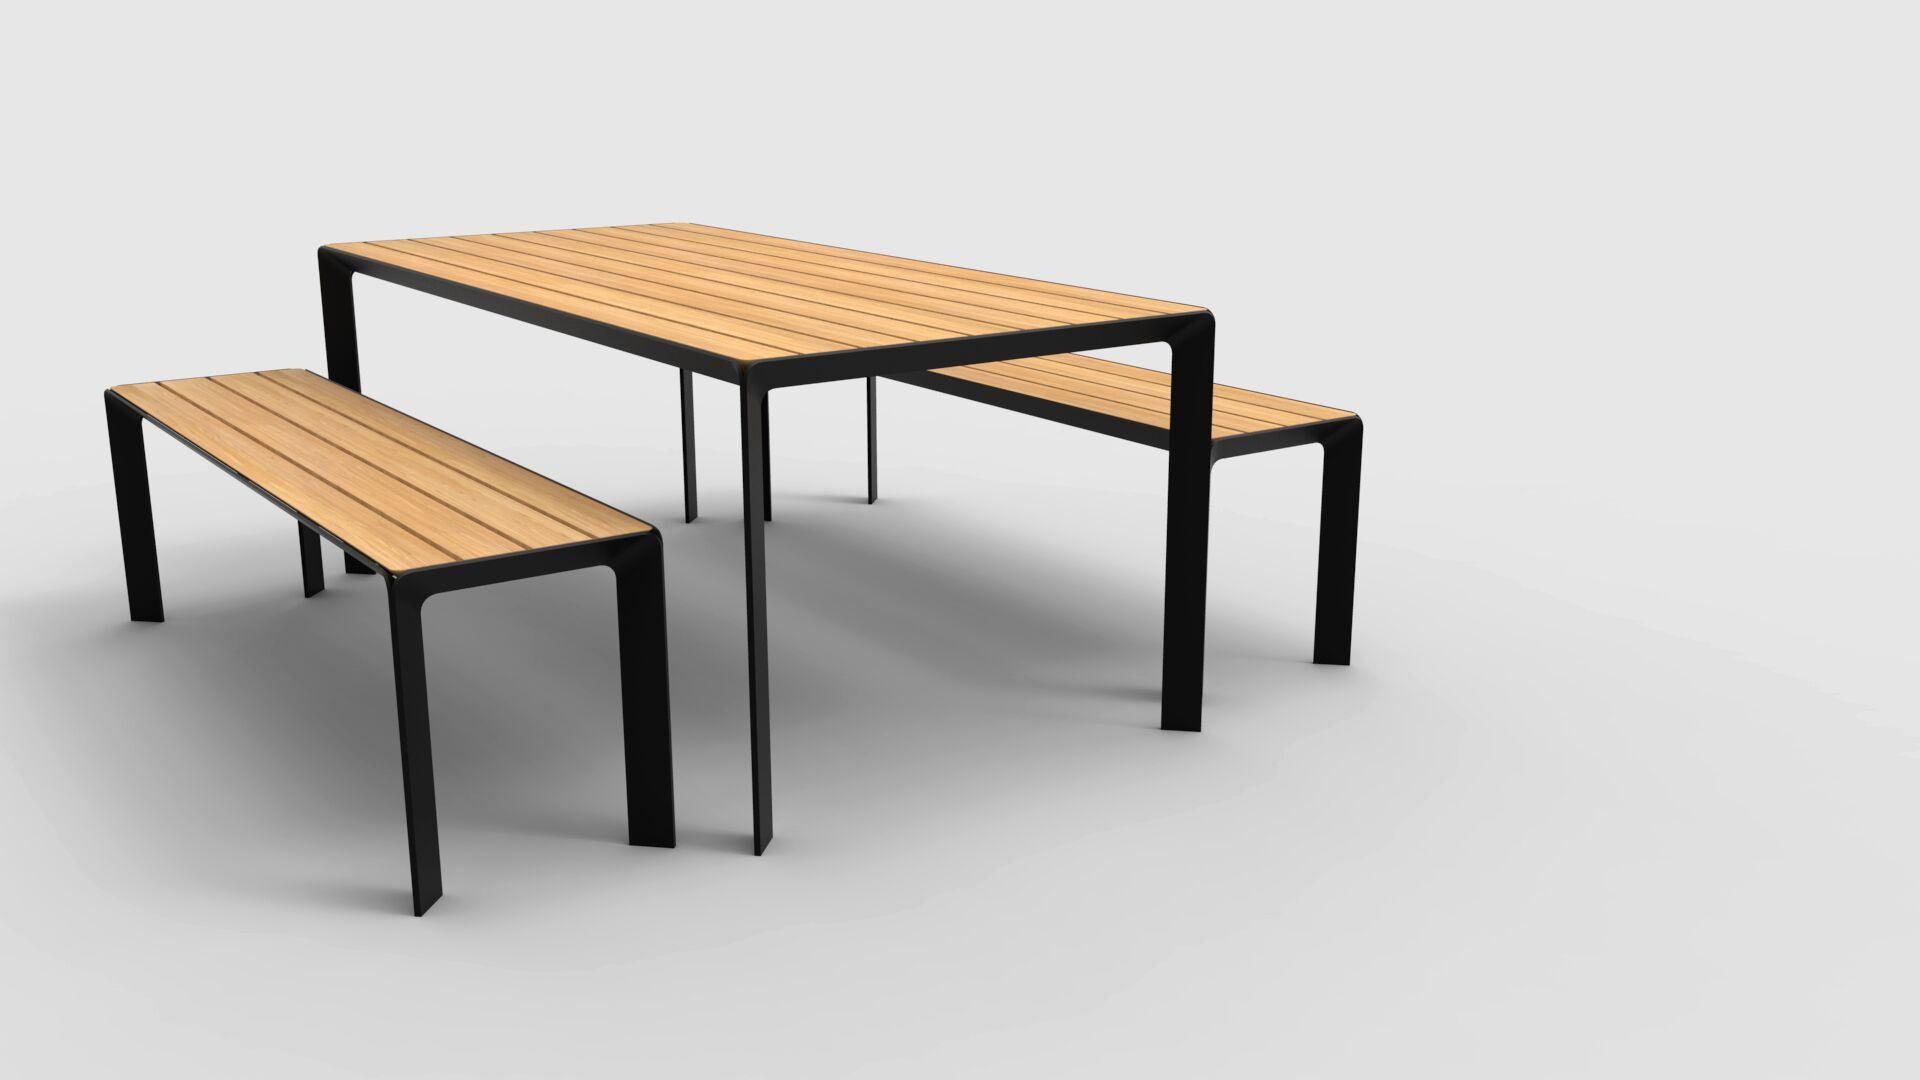 Gallery Of Arucs Bench Local Australian Industrial Design & Outdoor Furniture Brisbane, Qld Image 4